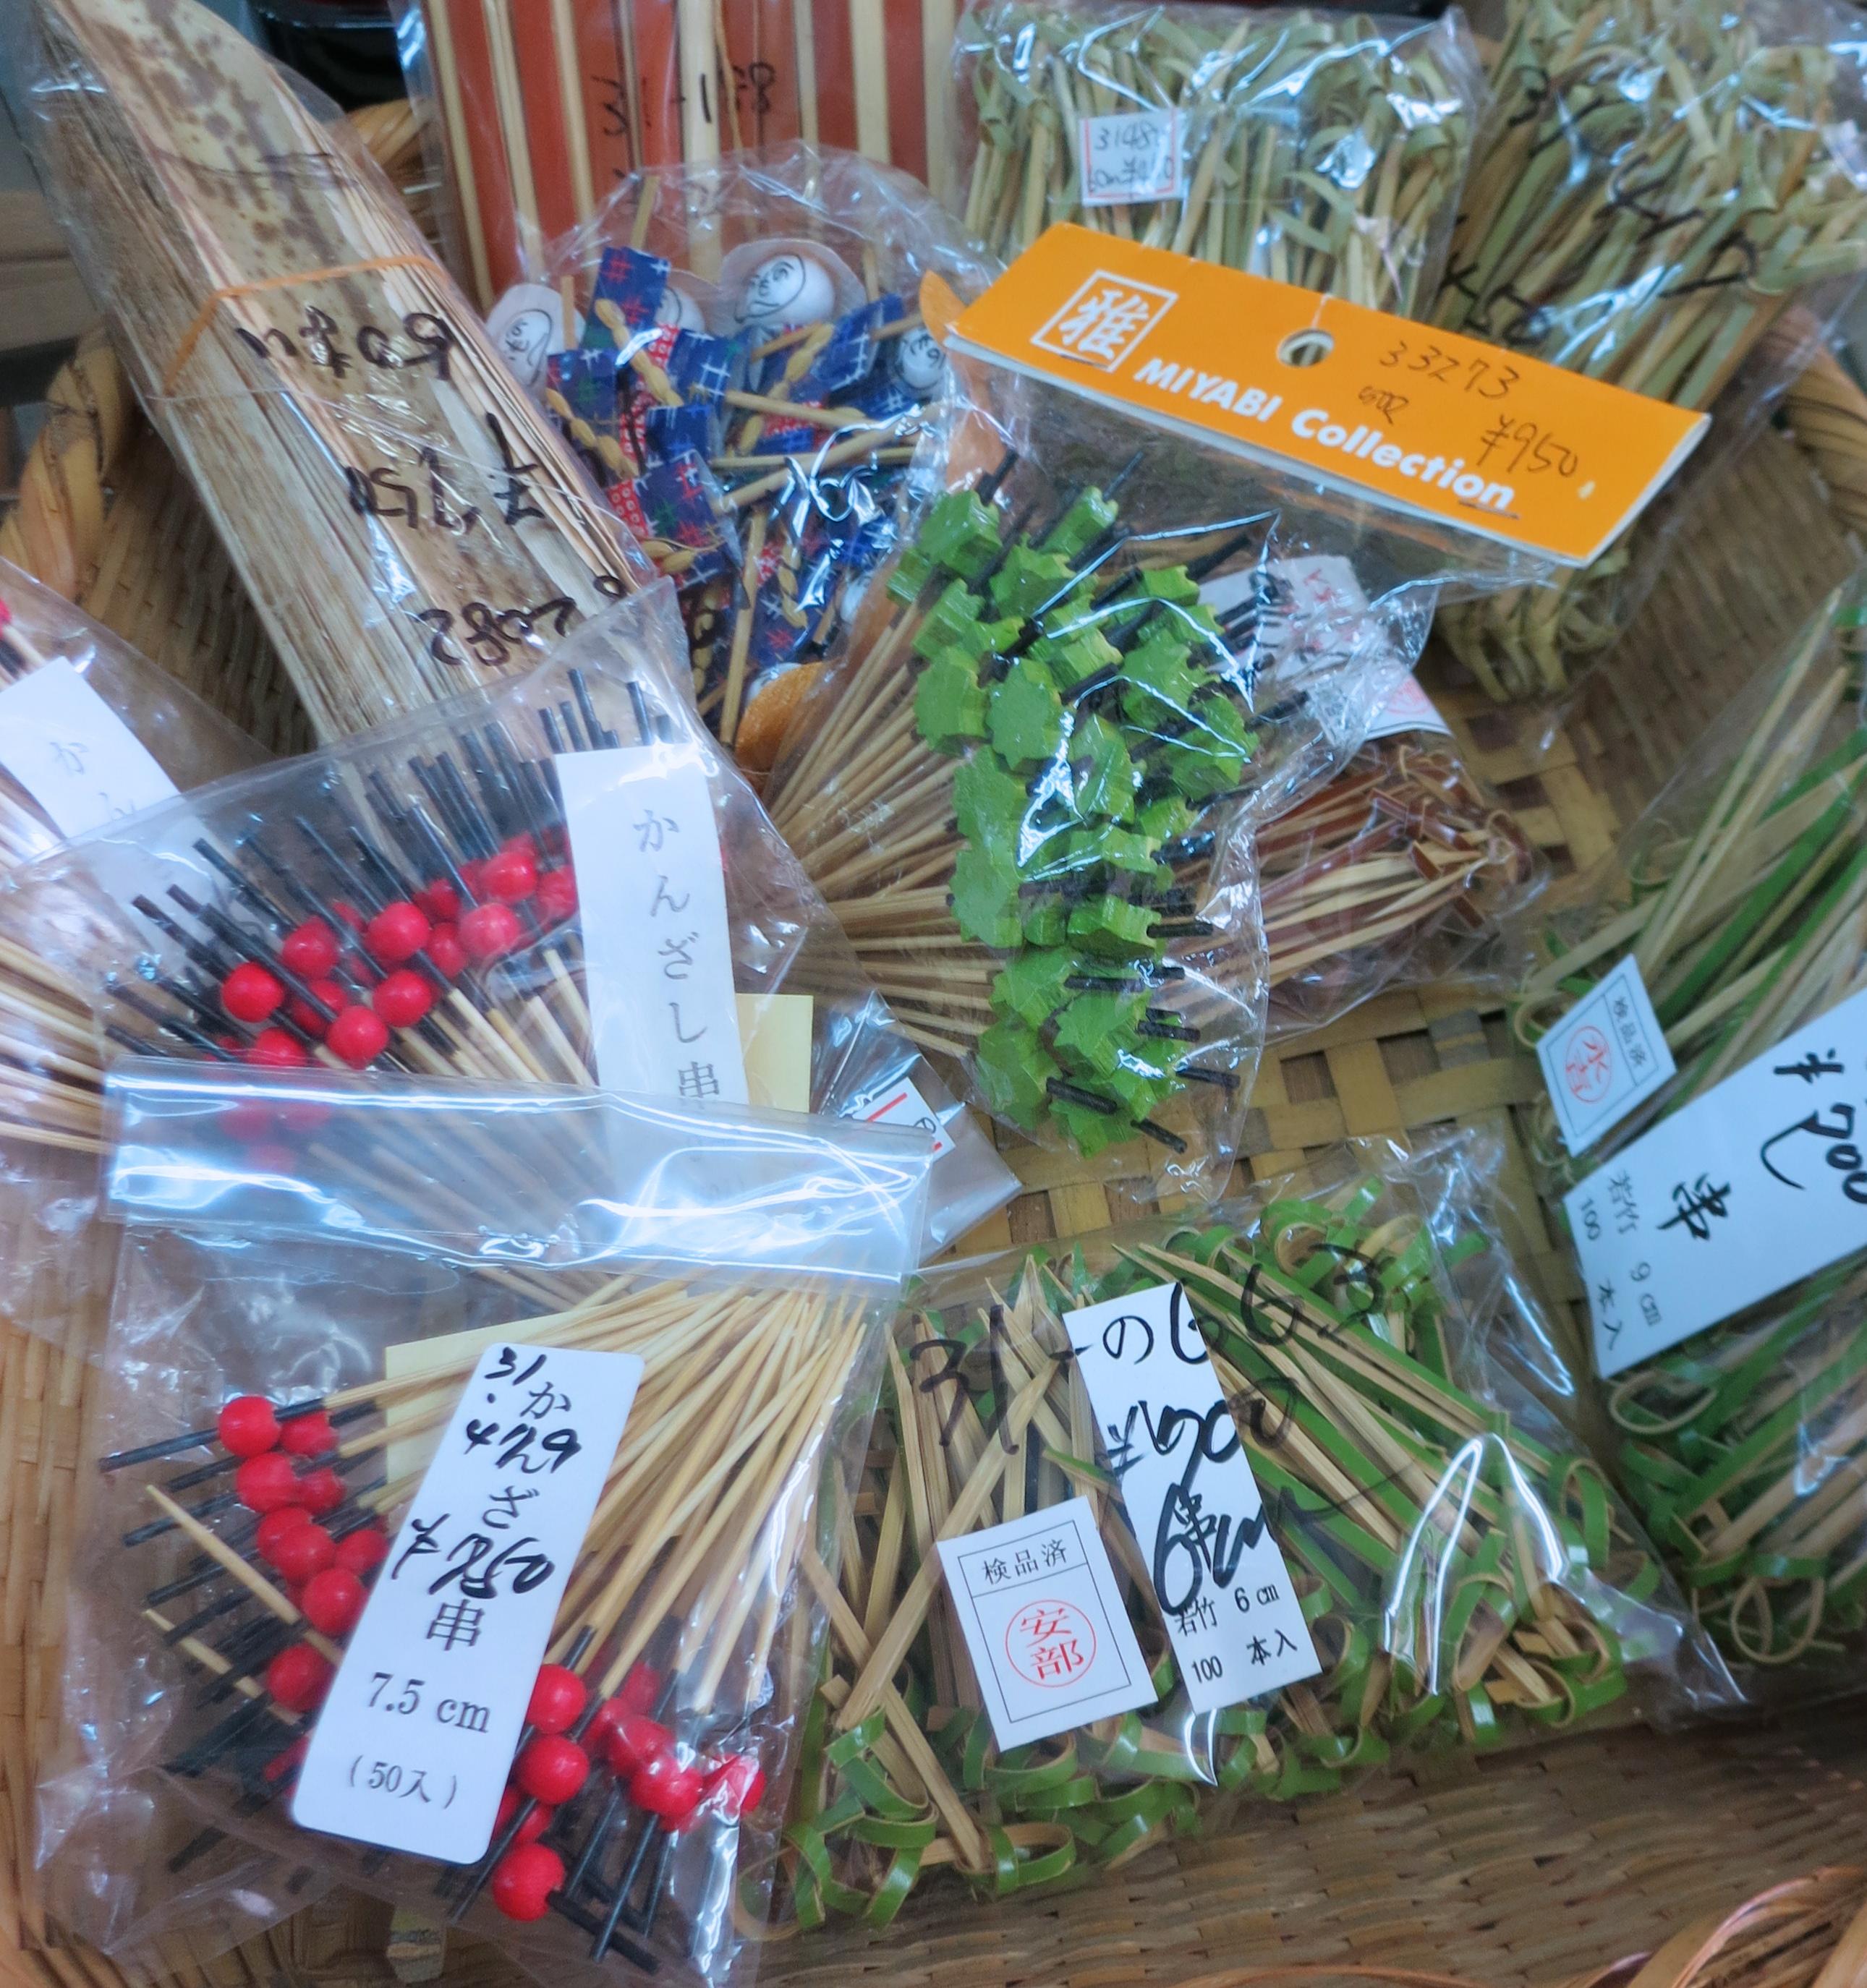 Serving Toothpicks Kappabashi Street Tokyo Japan